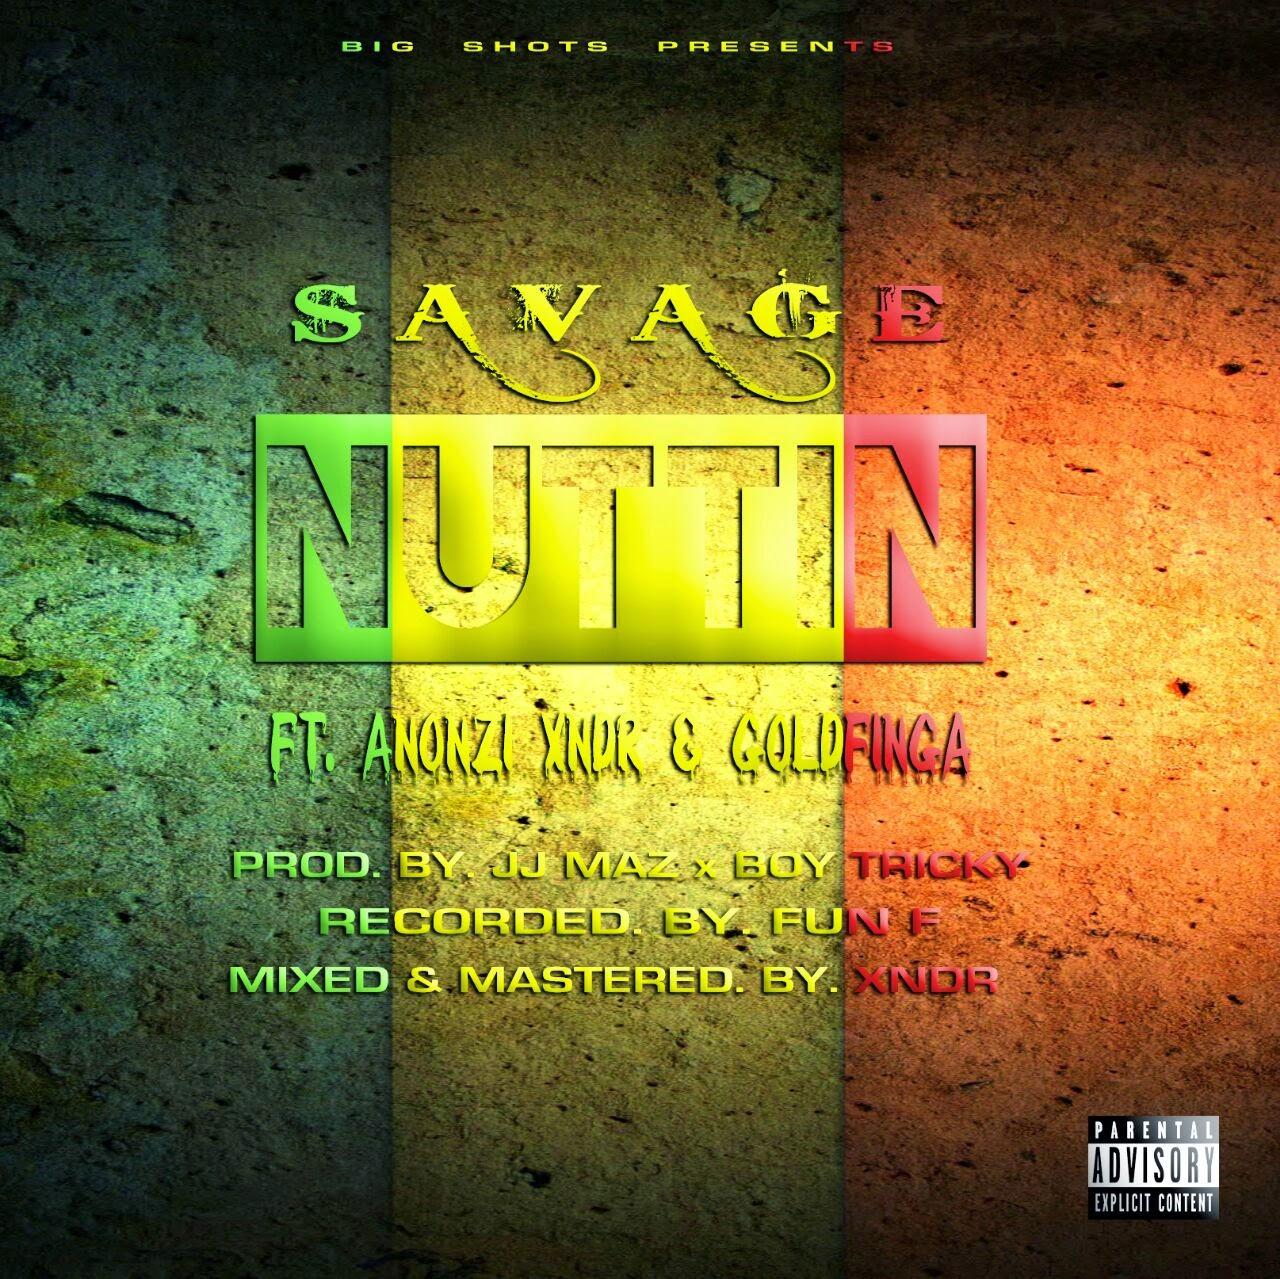 https://soundcloud.com/zimurbanlounge/zul-recommends-savage-nuttin-ft-anonzixndr-x-goldfinga/download